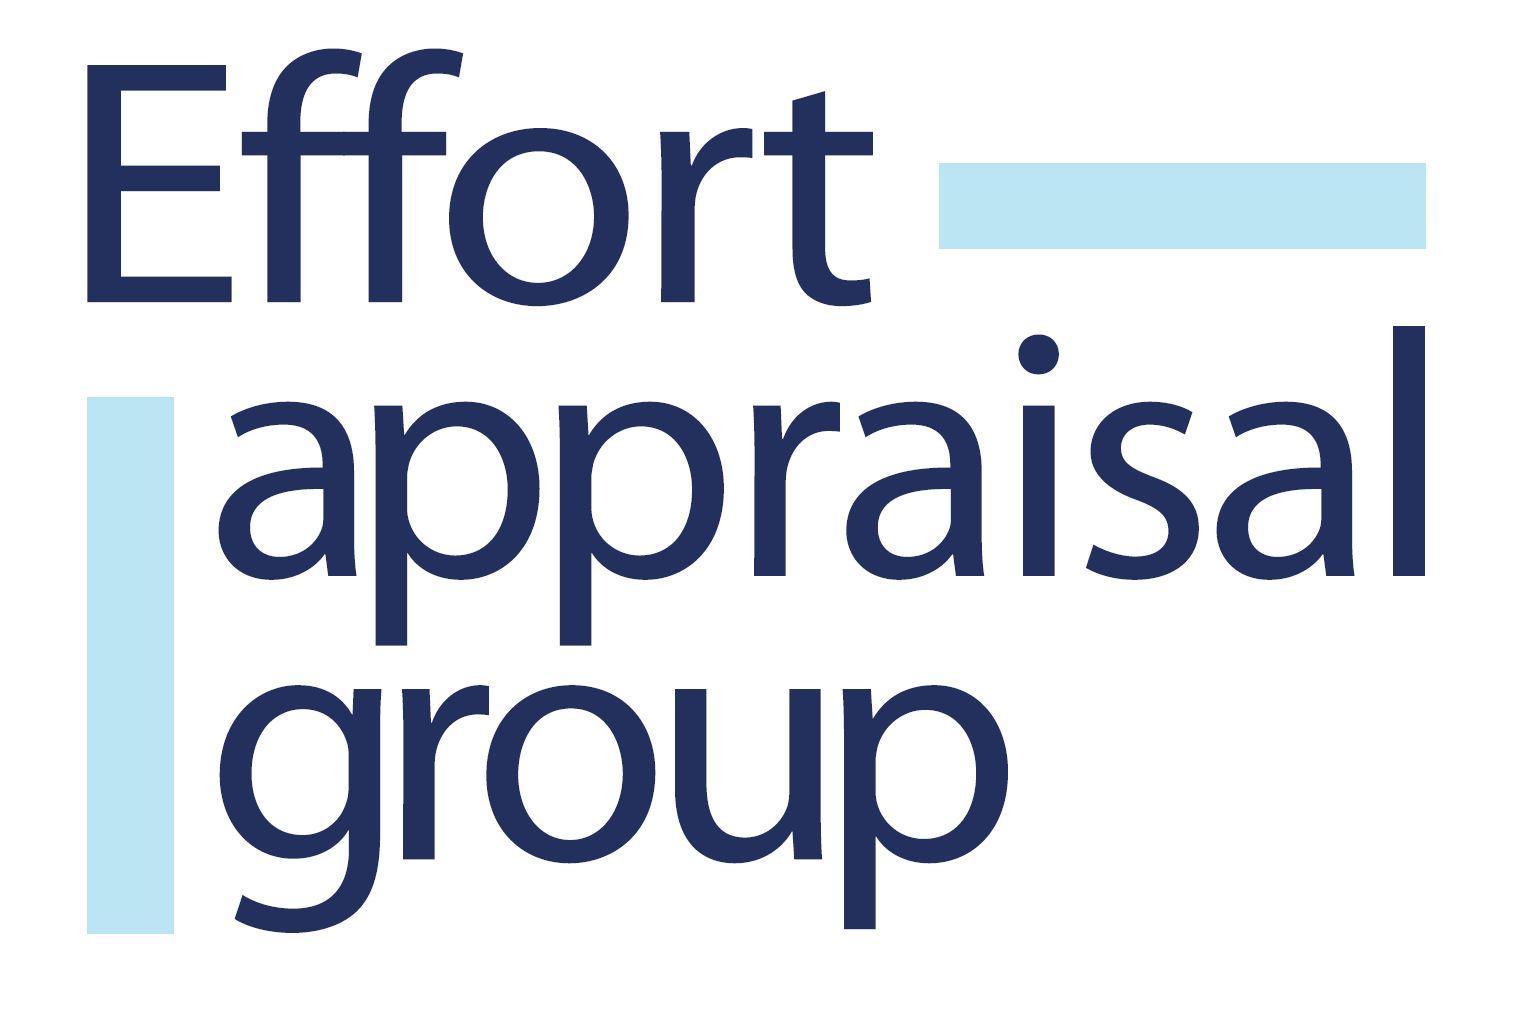 Effort Appraisal Group